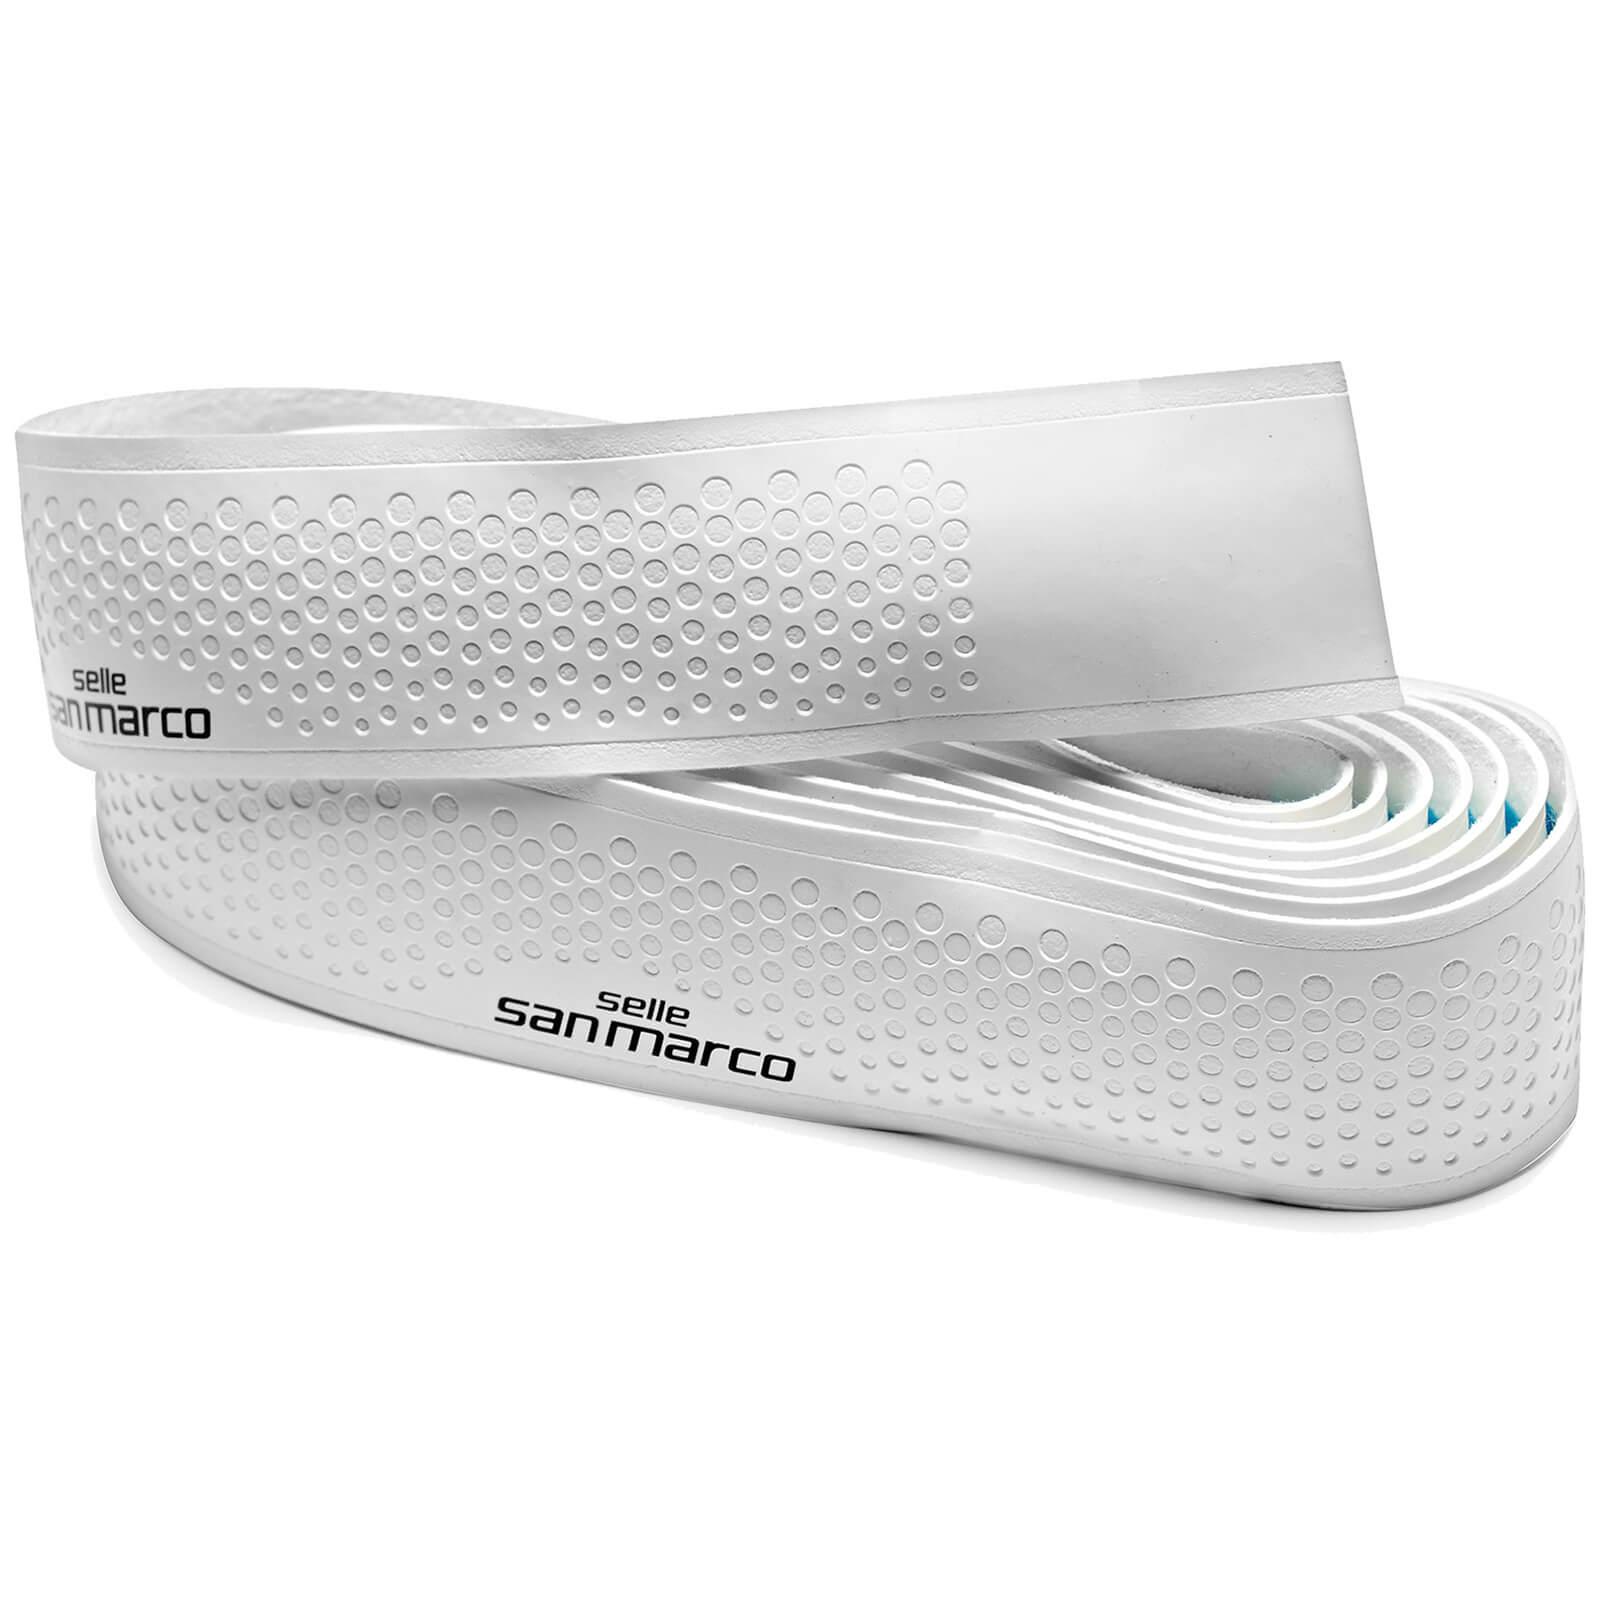 Selle San Marco Presa Corsa Team Handlebar Tape - White/Black